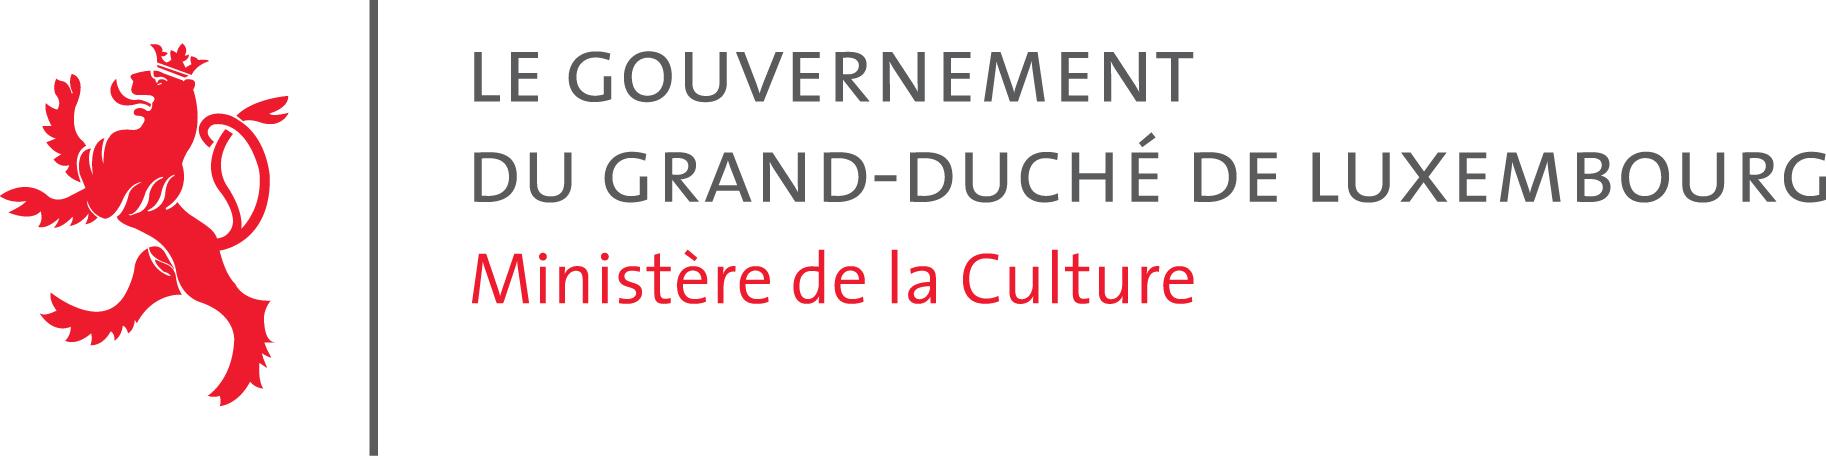 Kulturministerium